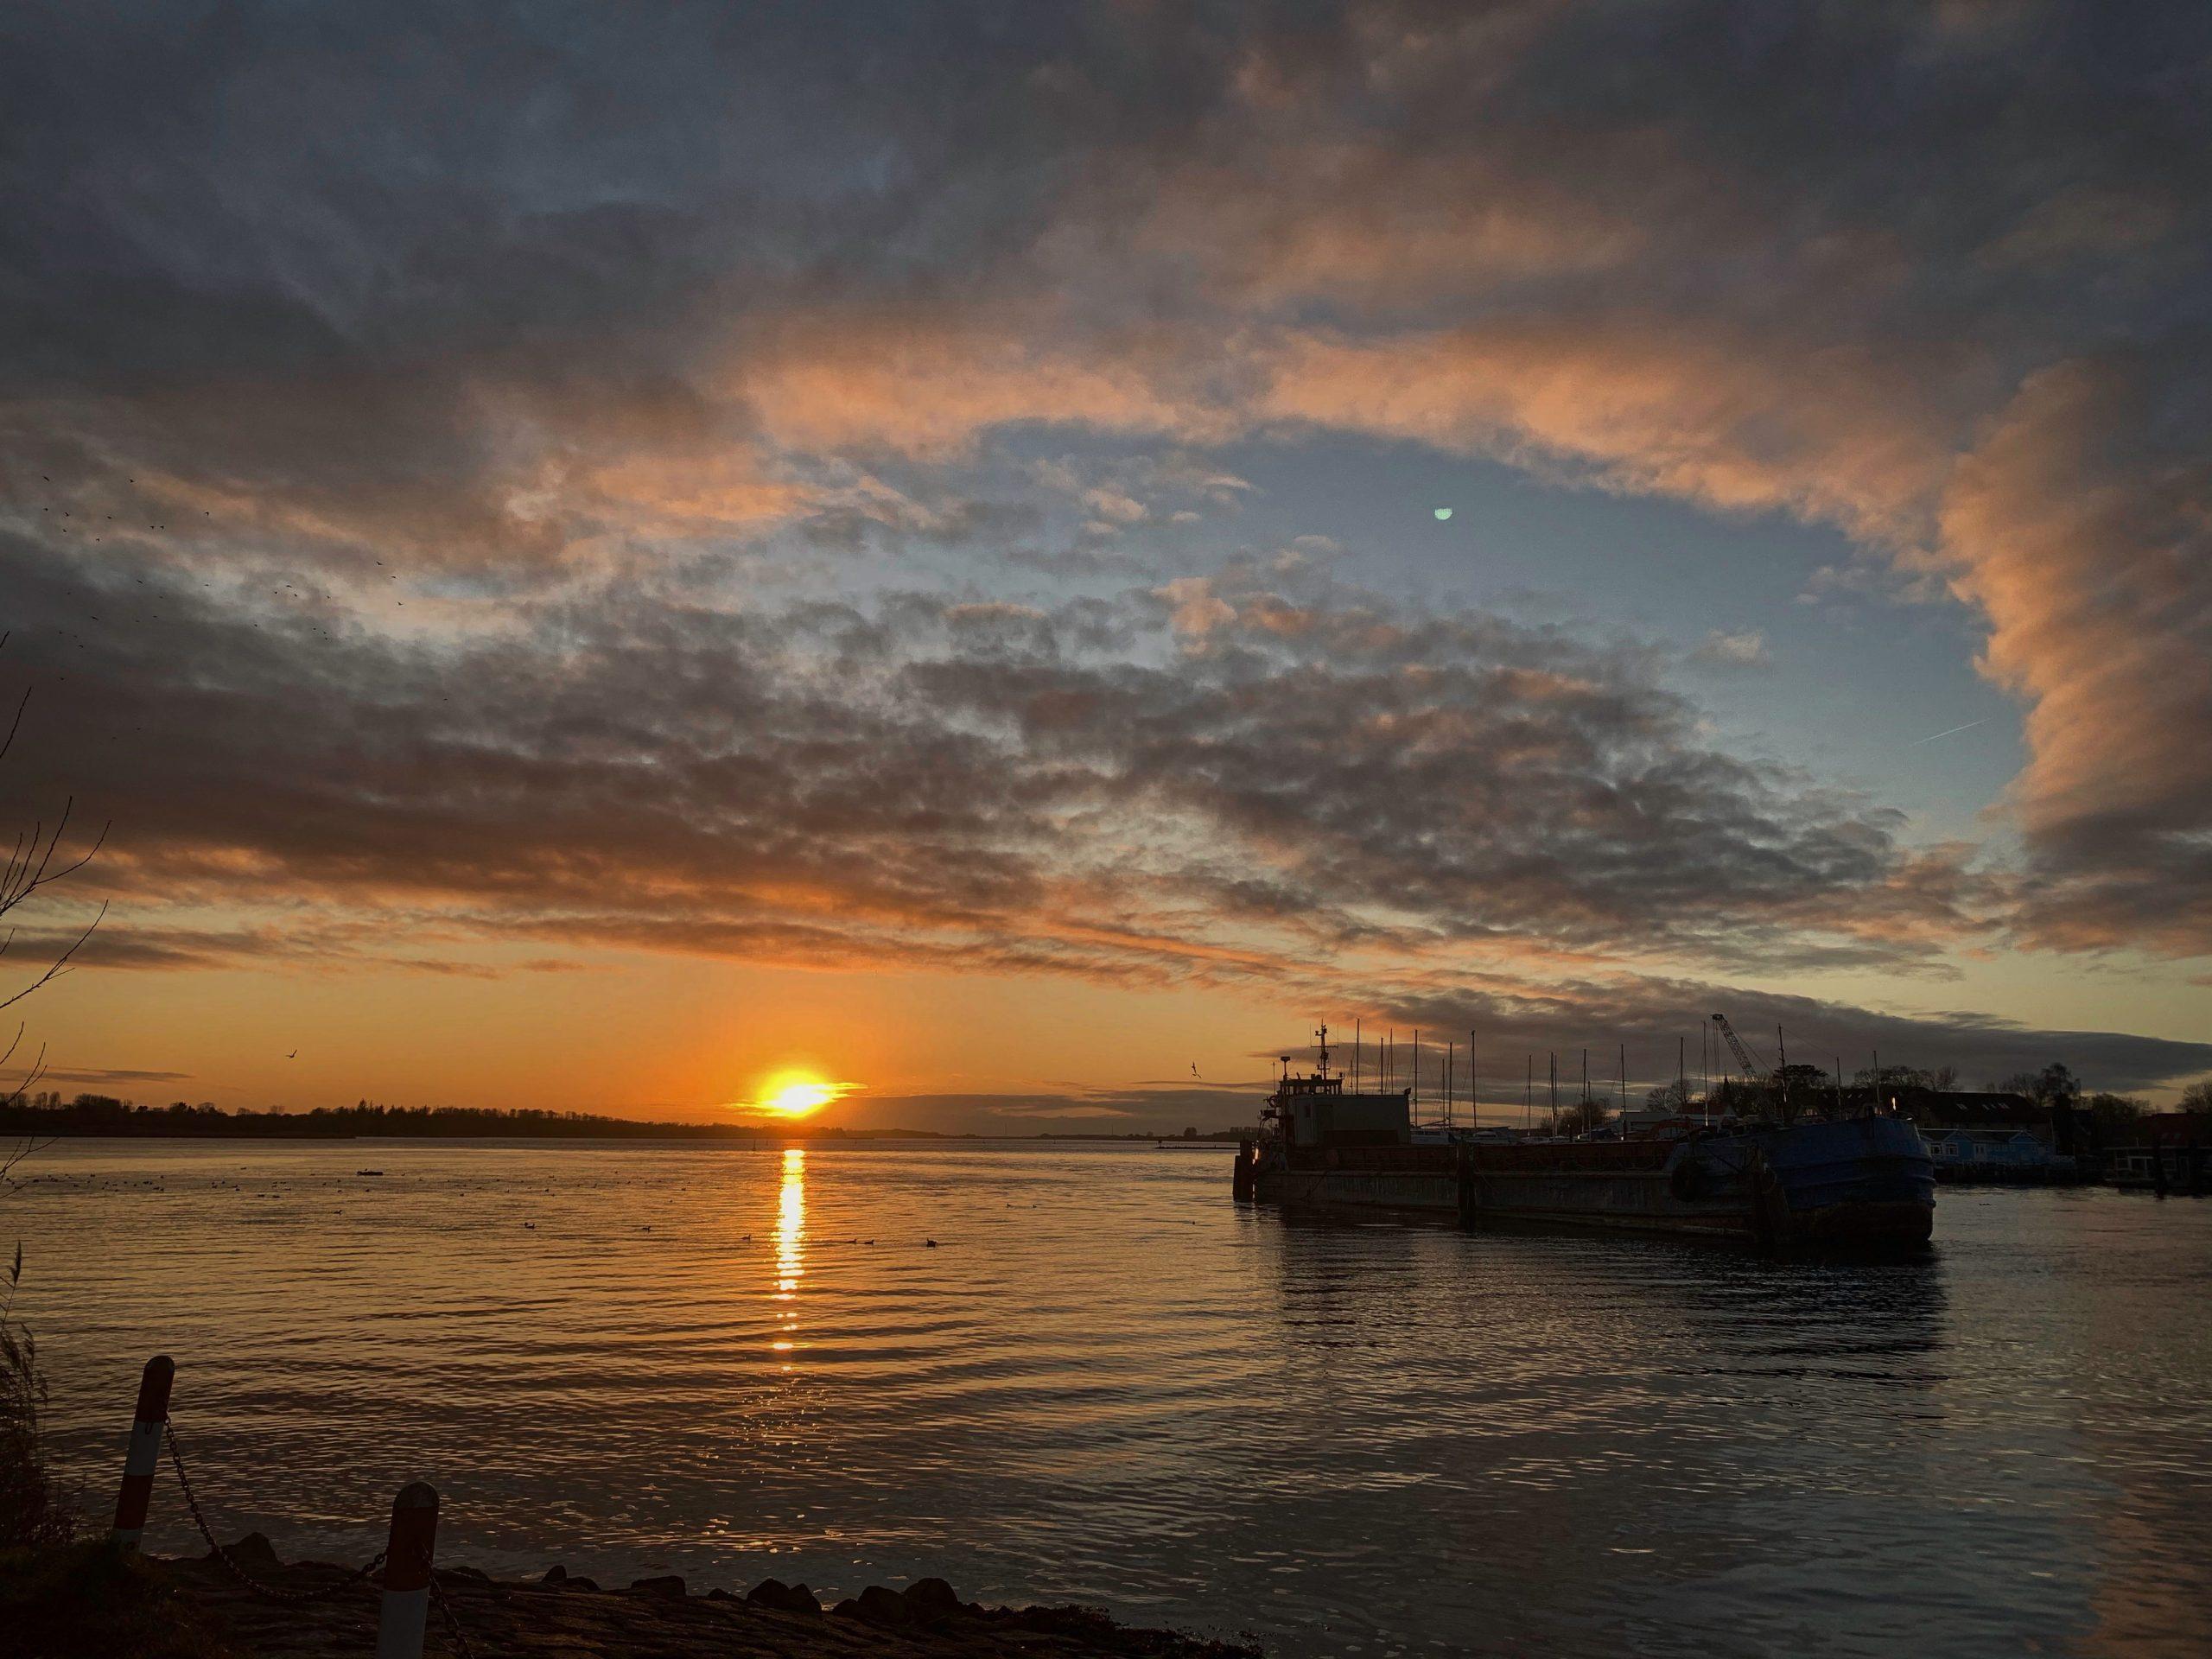 Impression Sonnenuntergang Schlei Sundsacker Event Nature scaled